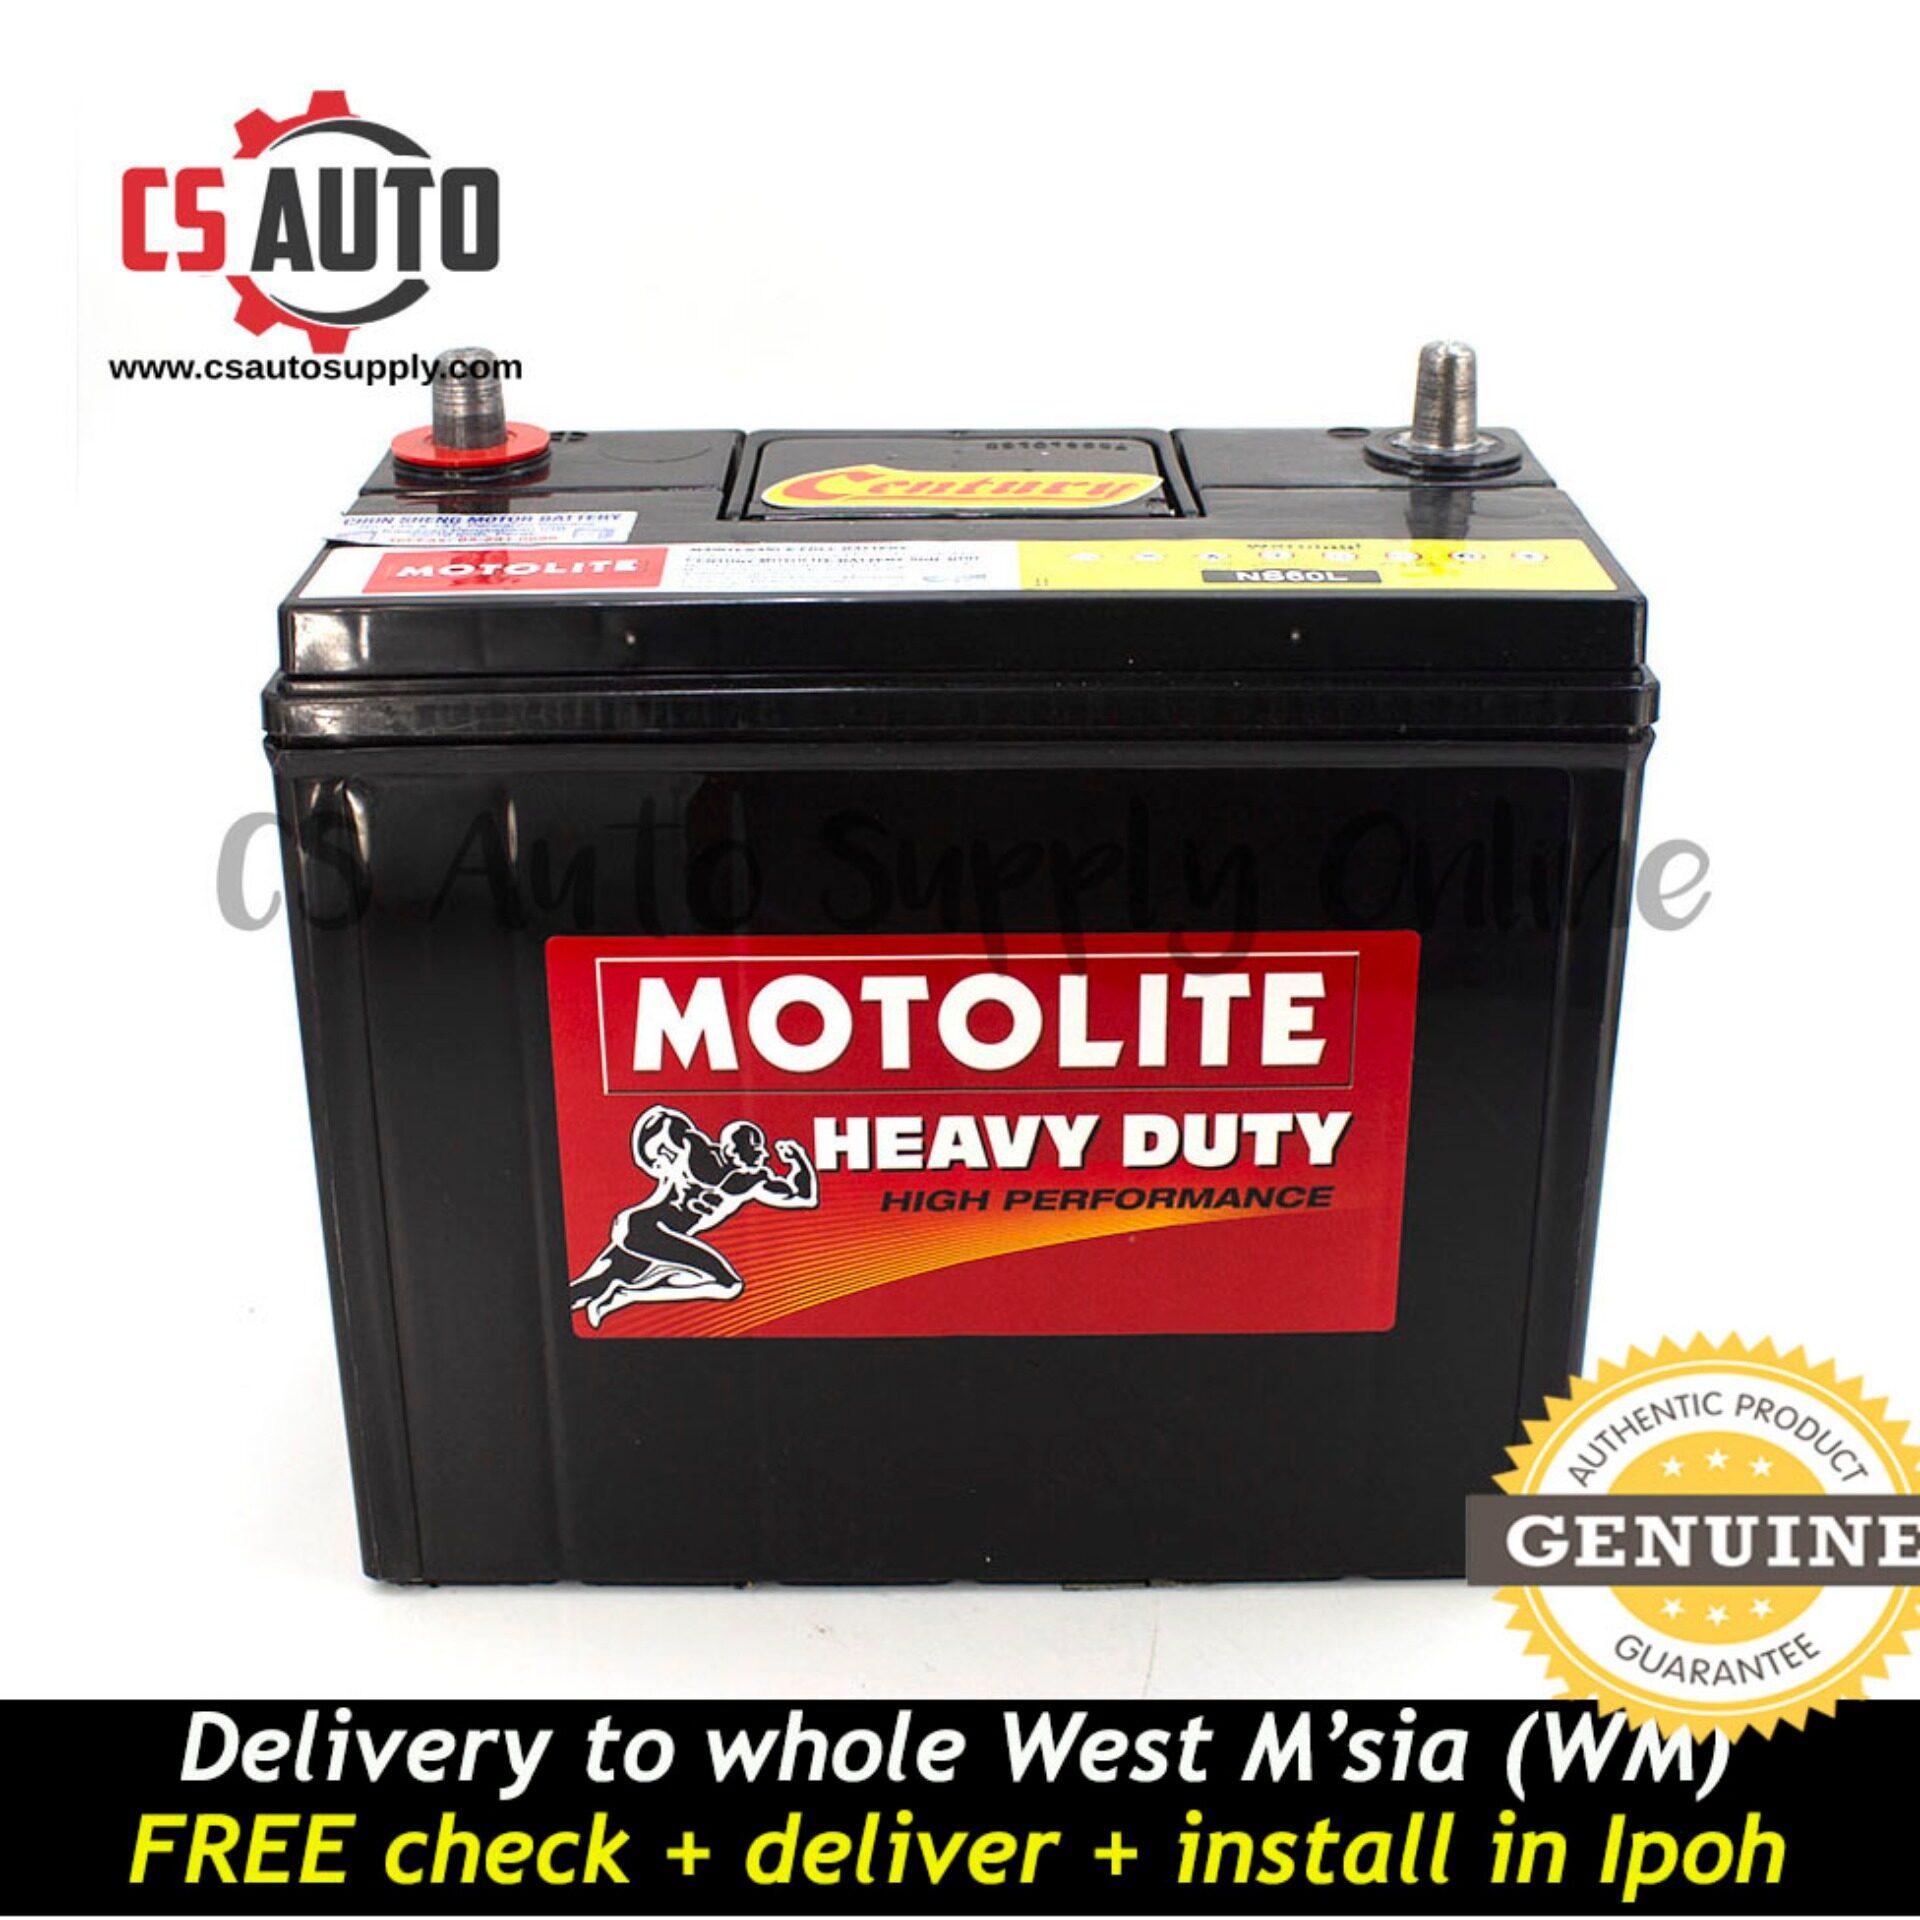 Century NS60L Motolite Small Terminal Battery MF for Toyota Vios, Honda C/H-RV, Civic, Nissan Almera and Grand Livina Ipoh area